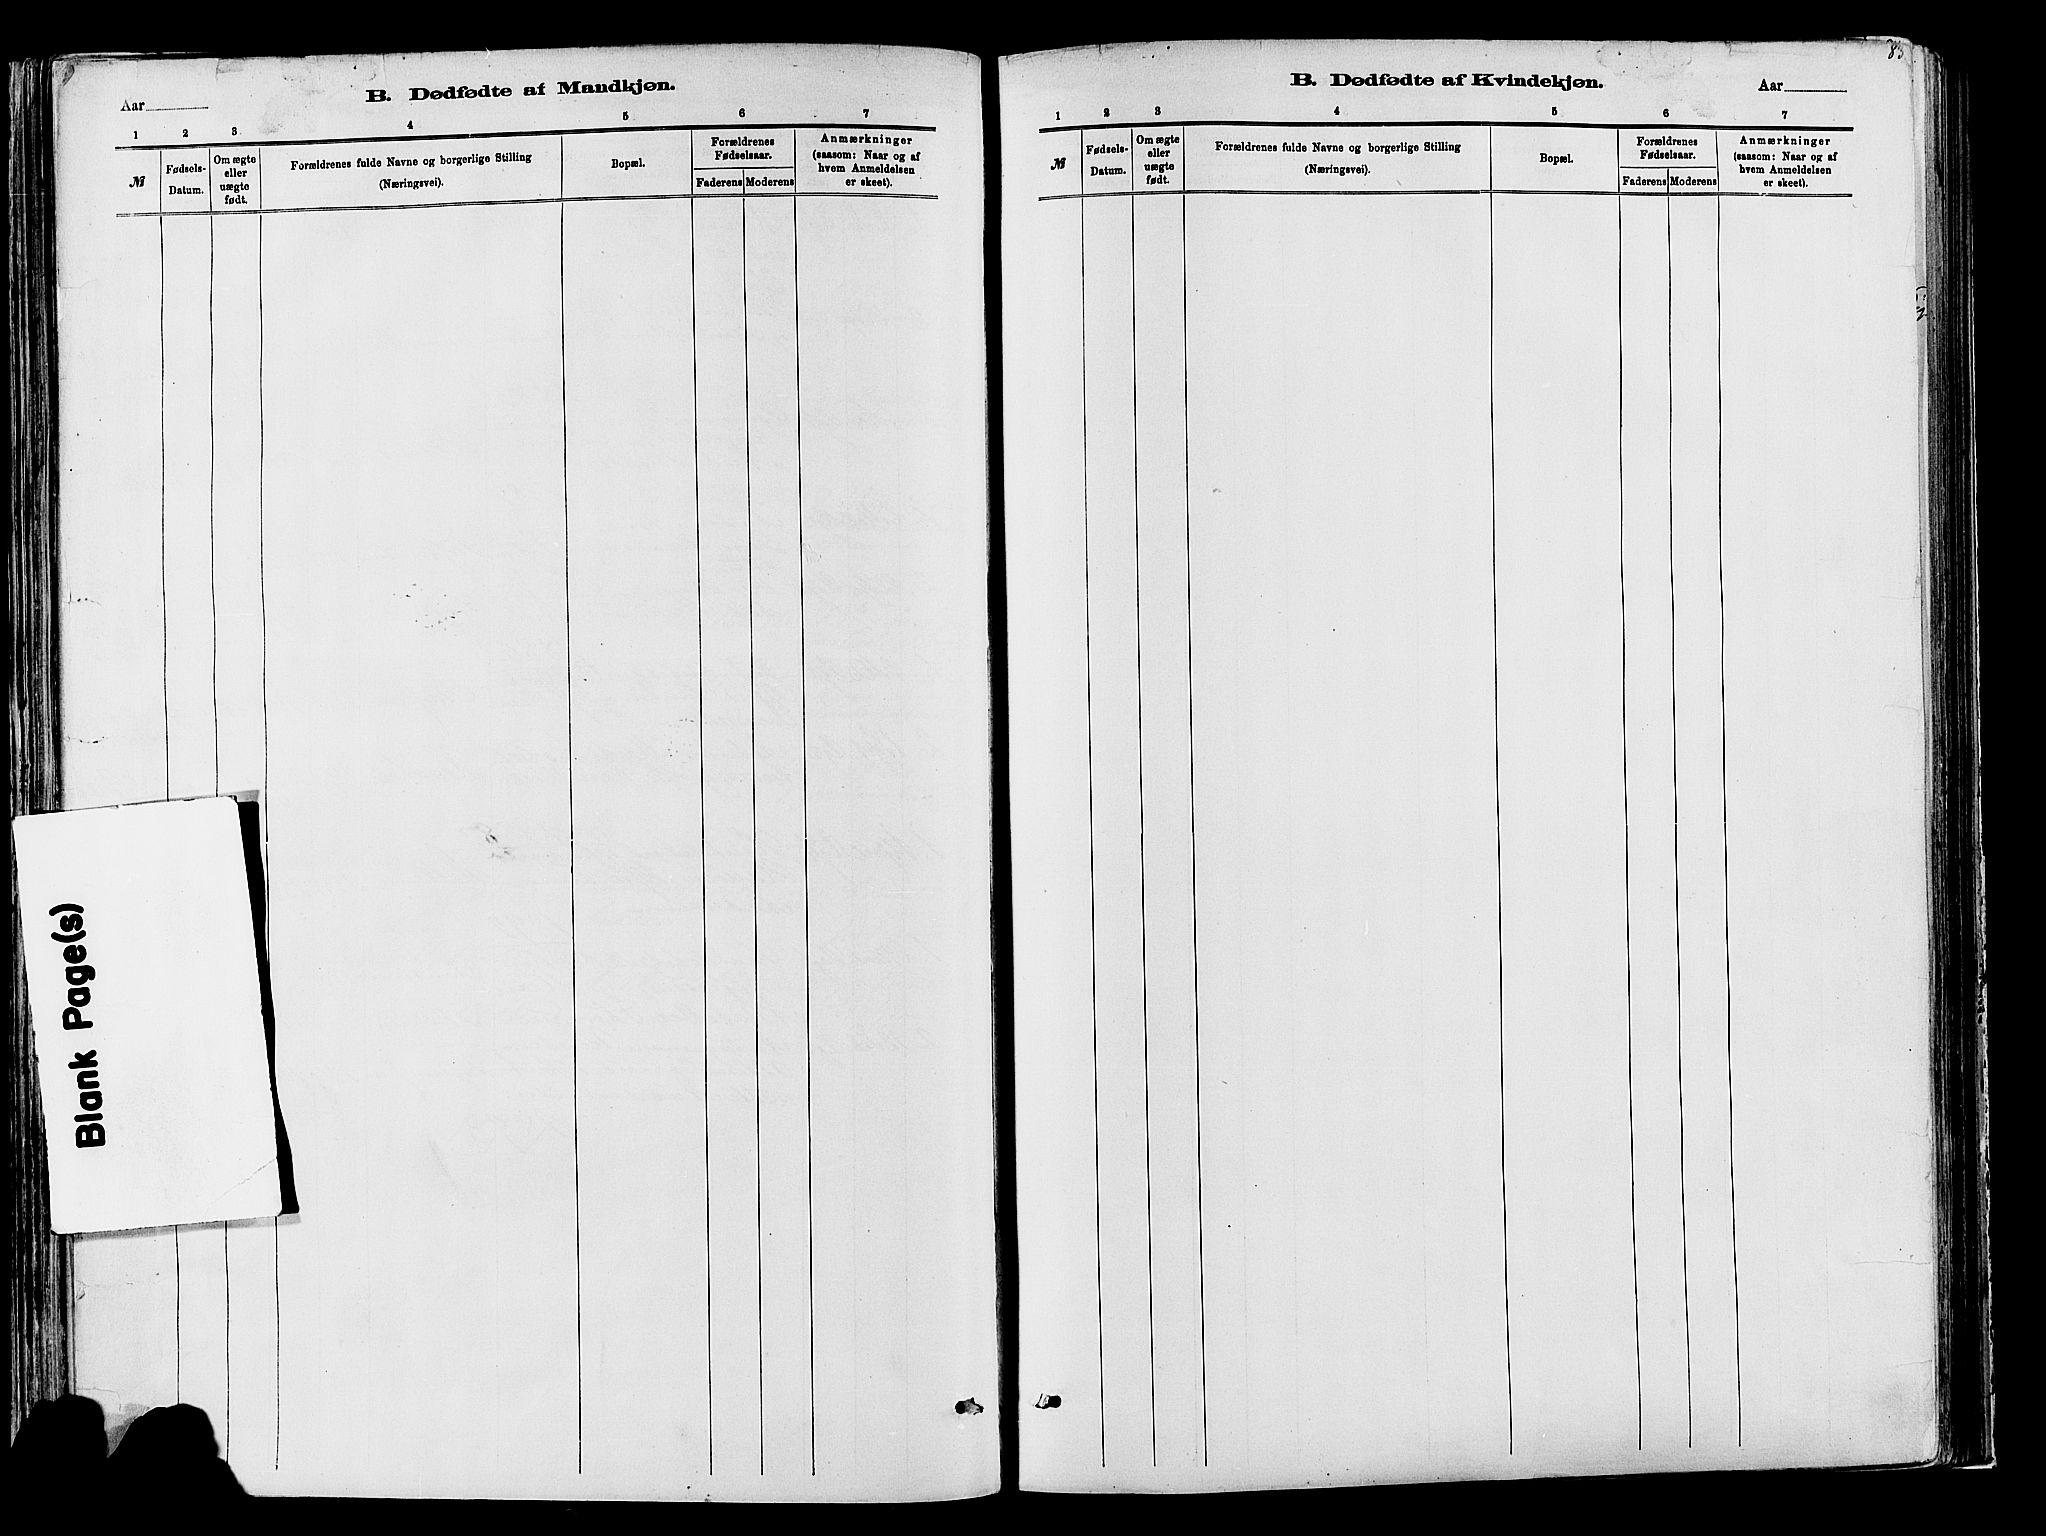 SAH, Vardal prestekontor, H/Ha/Haa/L0009: Ministerialbok nr. 9, 1878-1892, s. 83